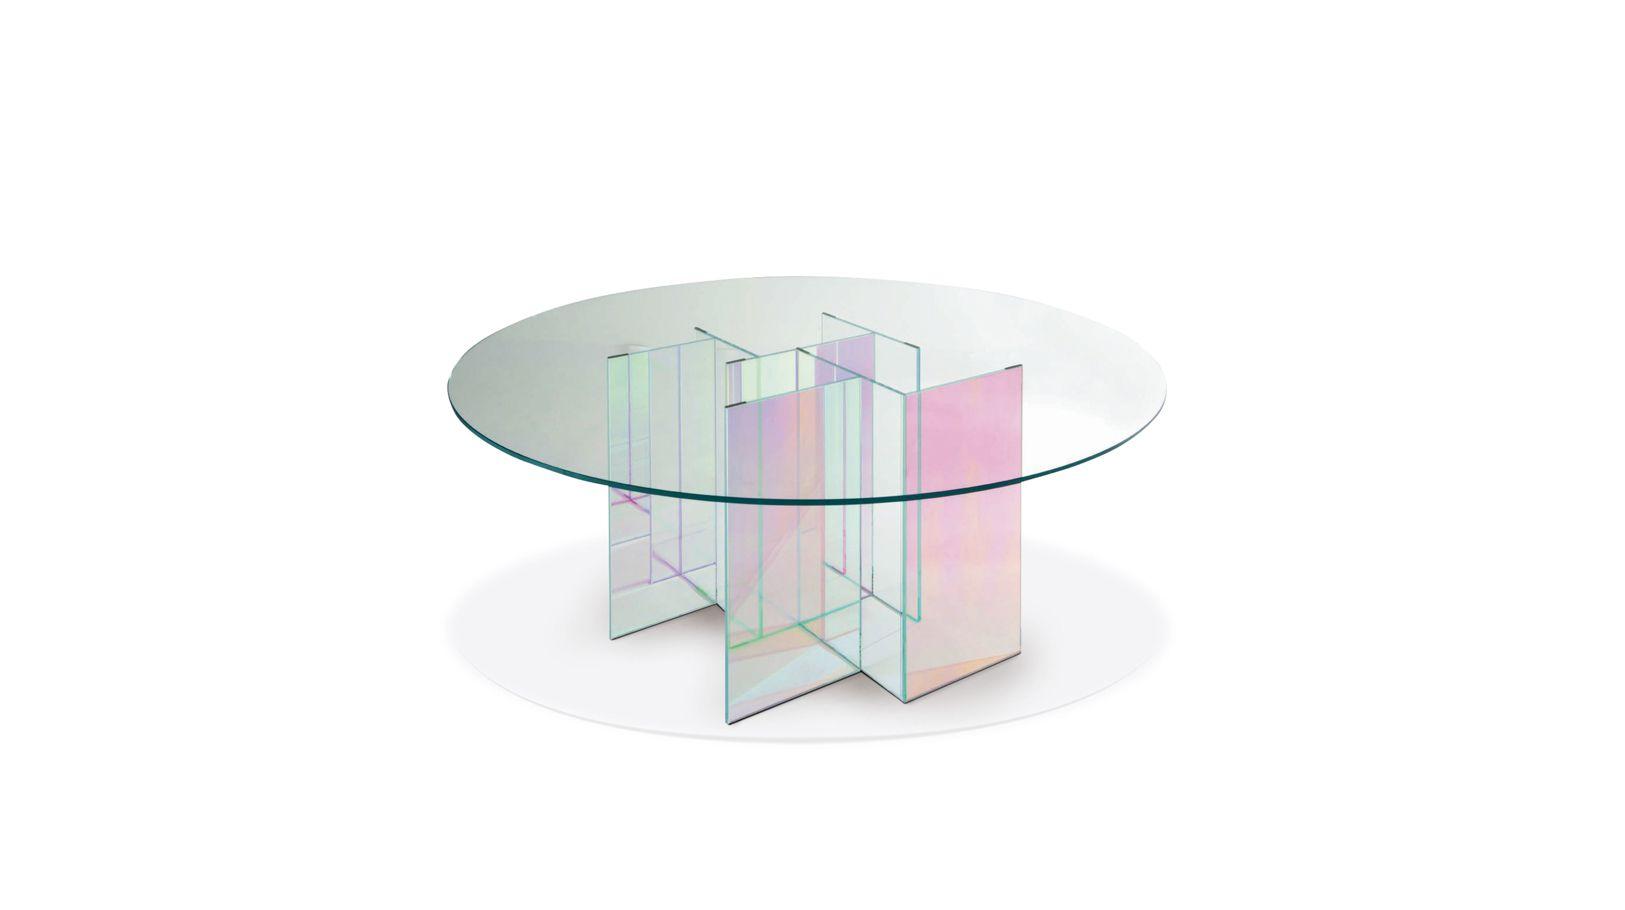 Diapo dining table roche bobois for Table basse verre roche bobois